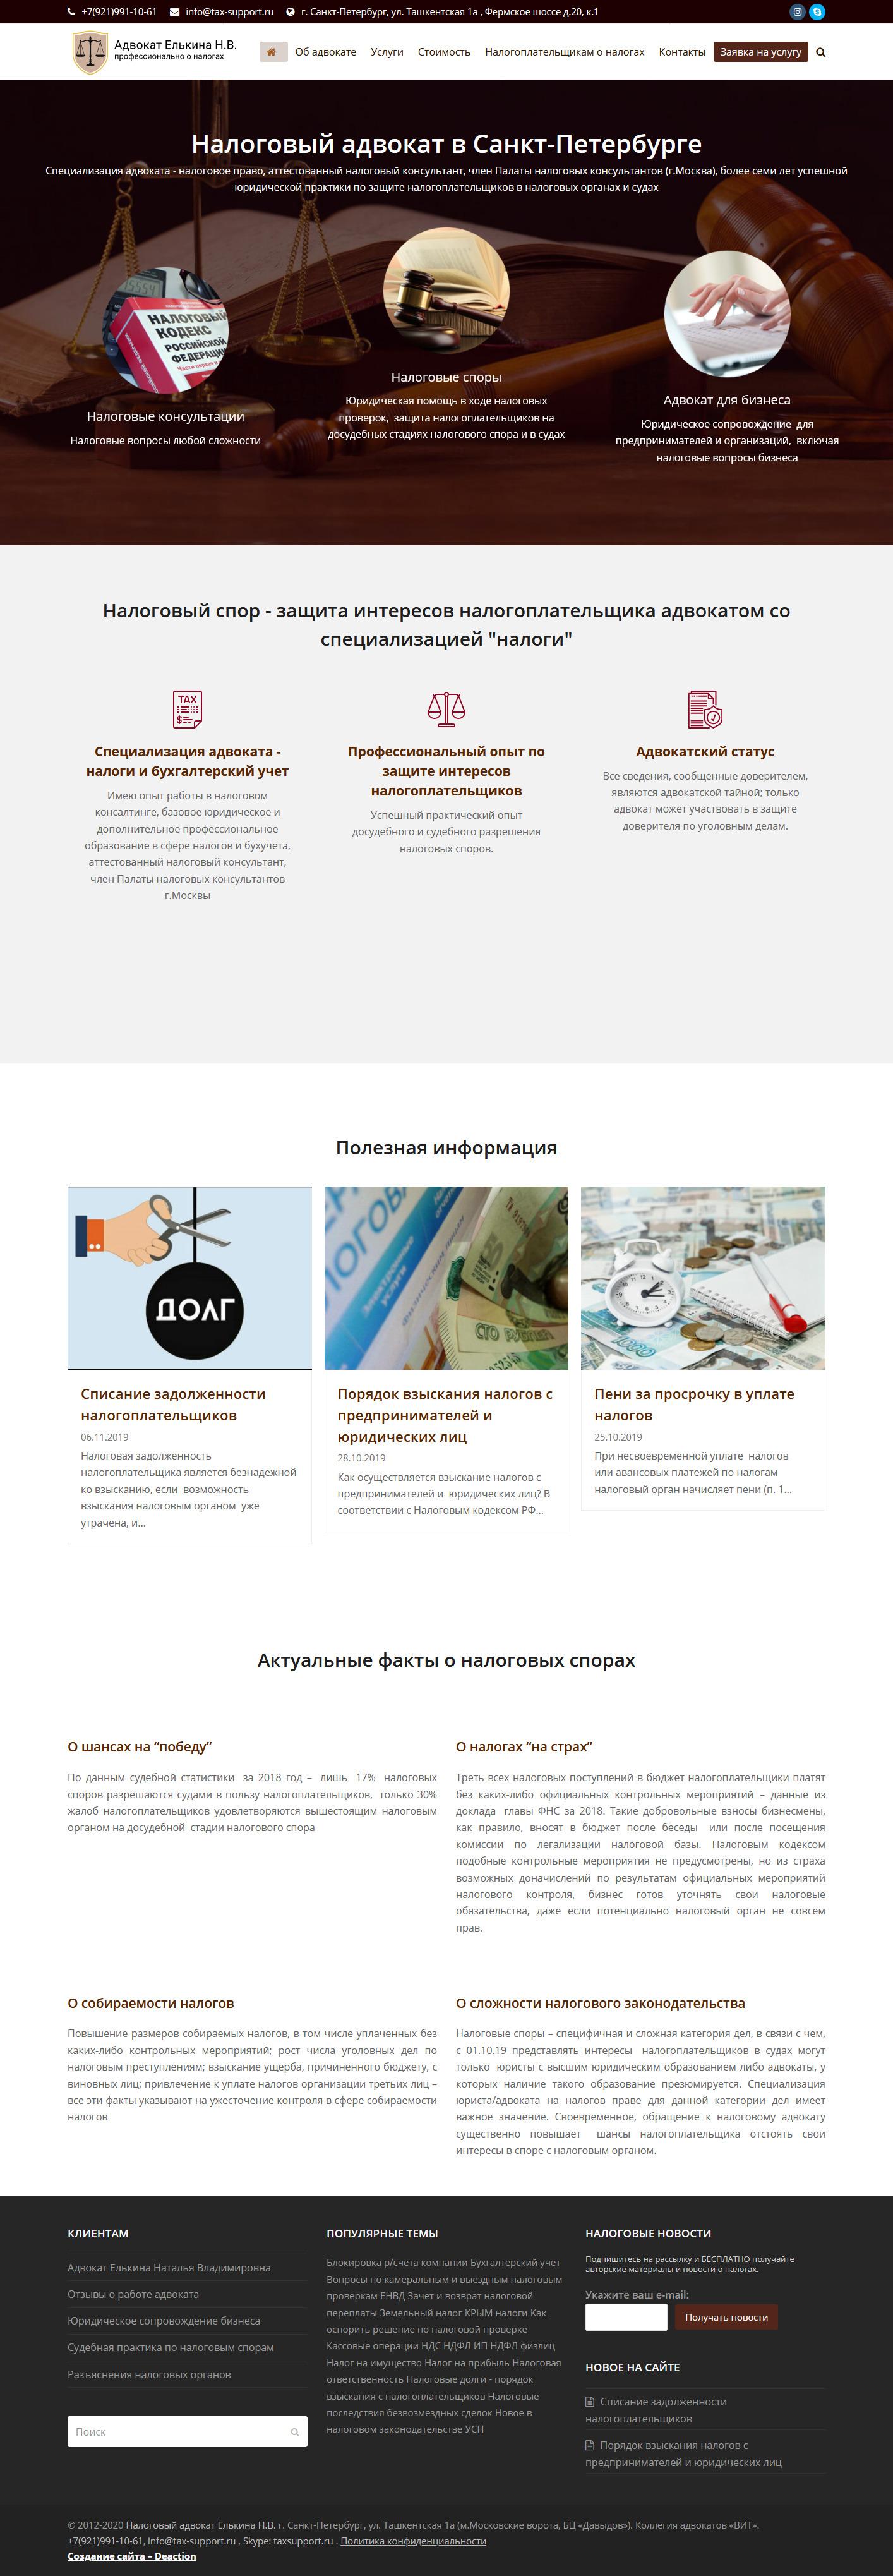 tax-support-spb создание сайта налогового адвоката